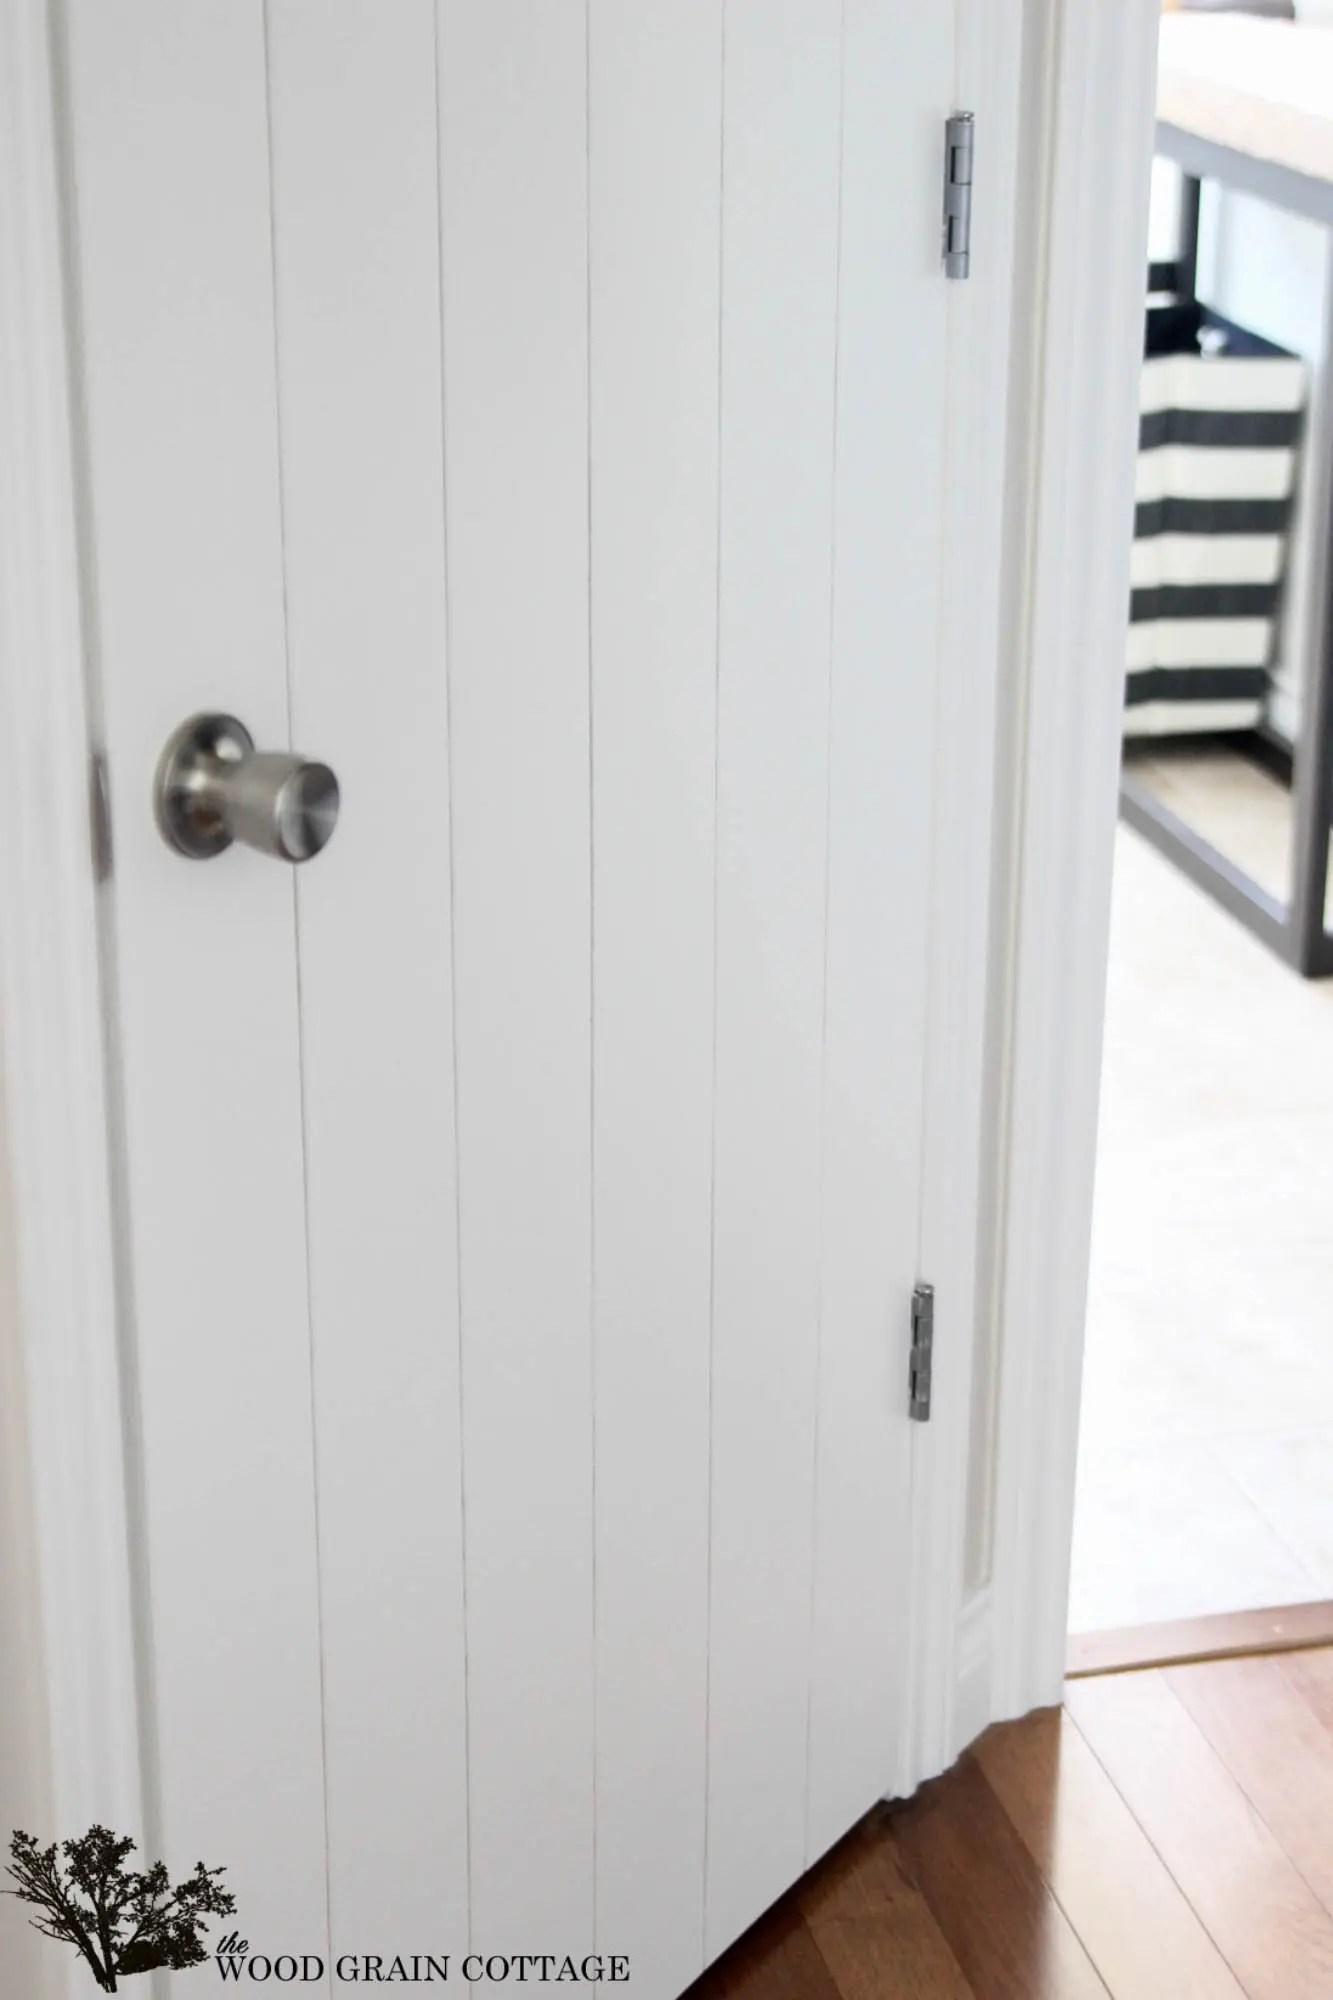 DIY Plank Door by The Wood Grain Cottage & How to Wood Plank a Door - Infarrantly Creative